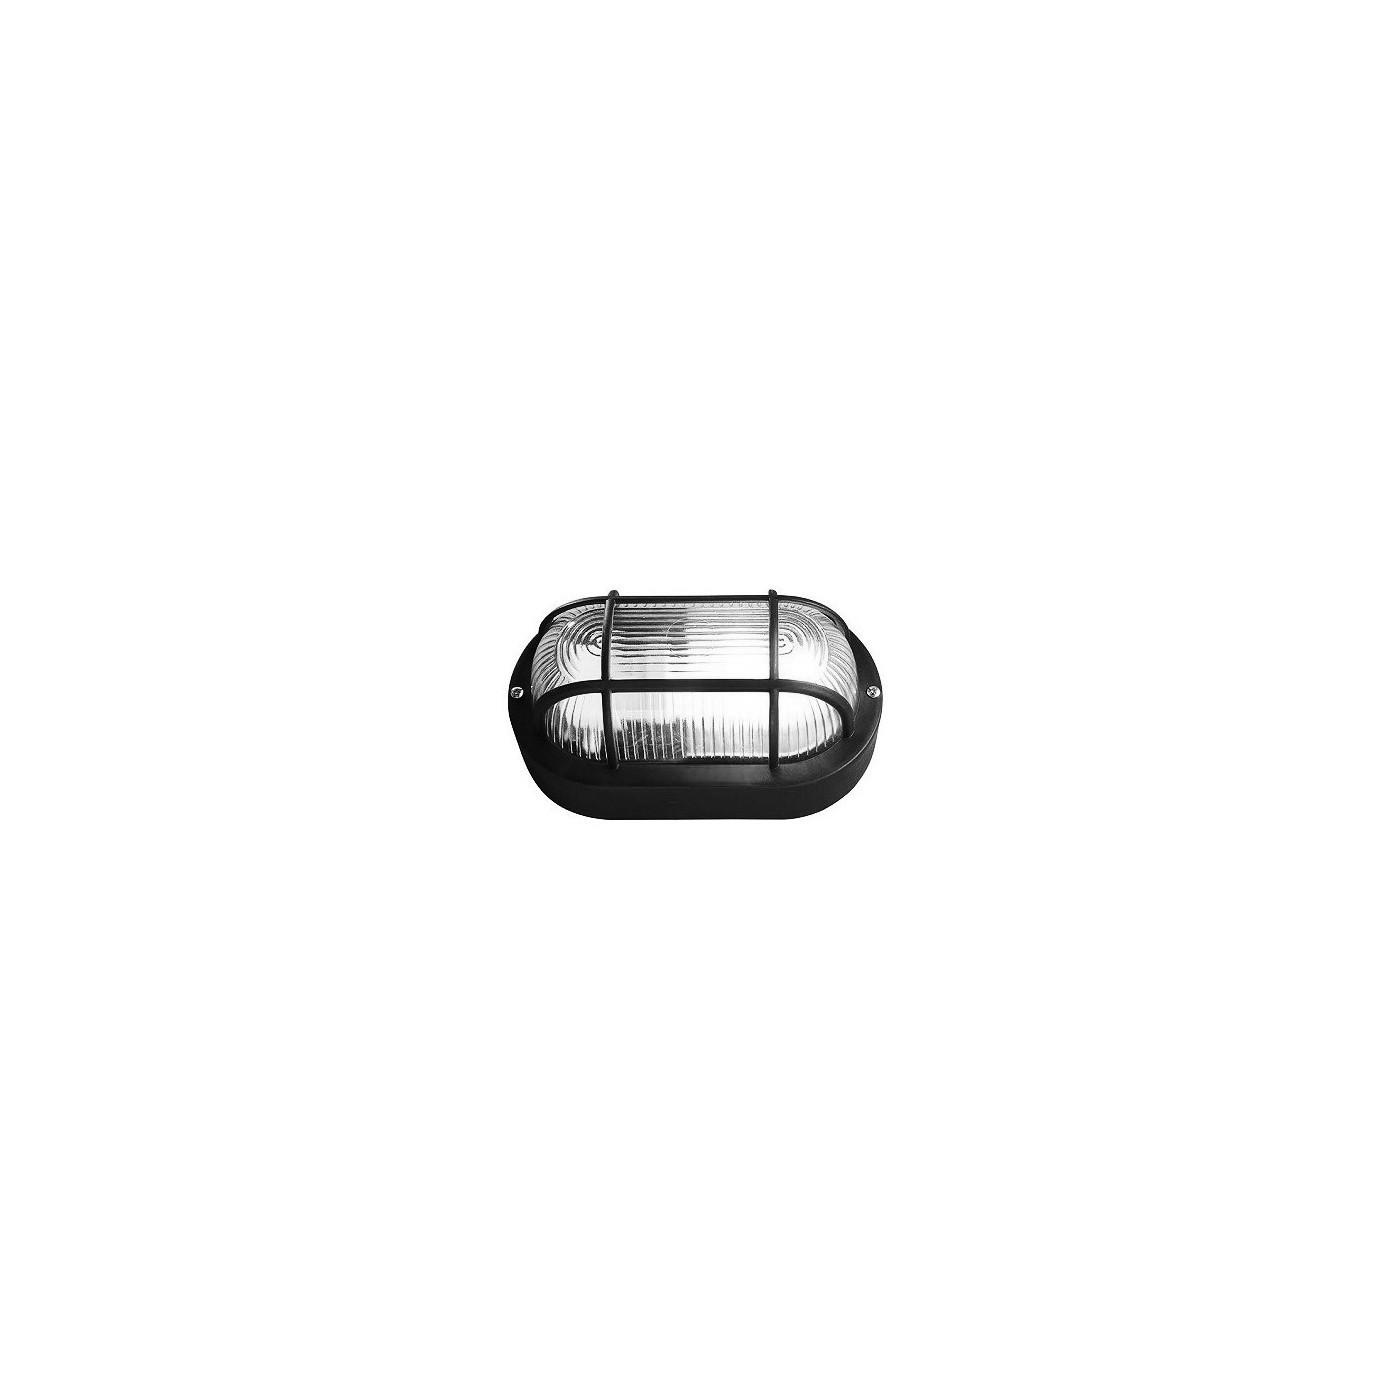 Lámpara Bullseye (Bulleye), negra E27, aspecto industrial, resistente al agua  - 1